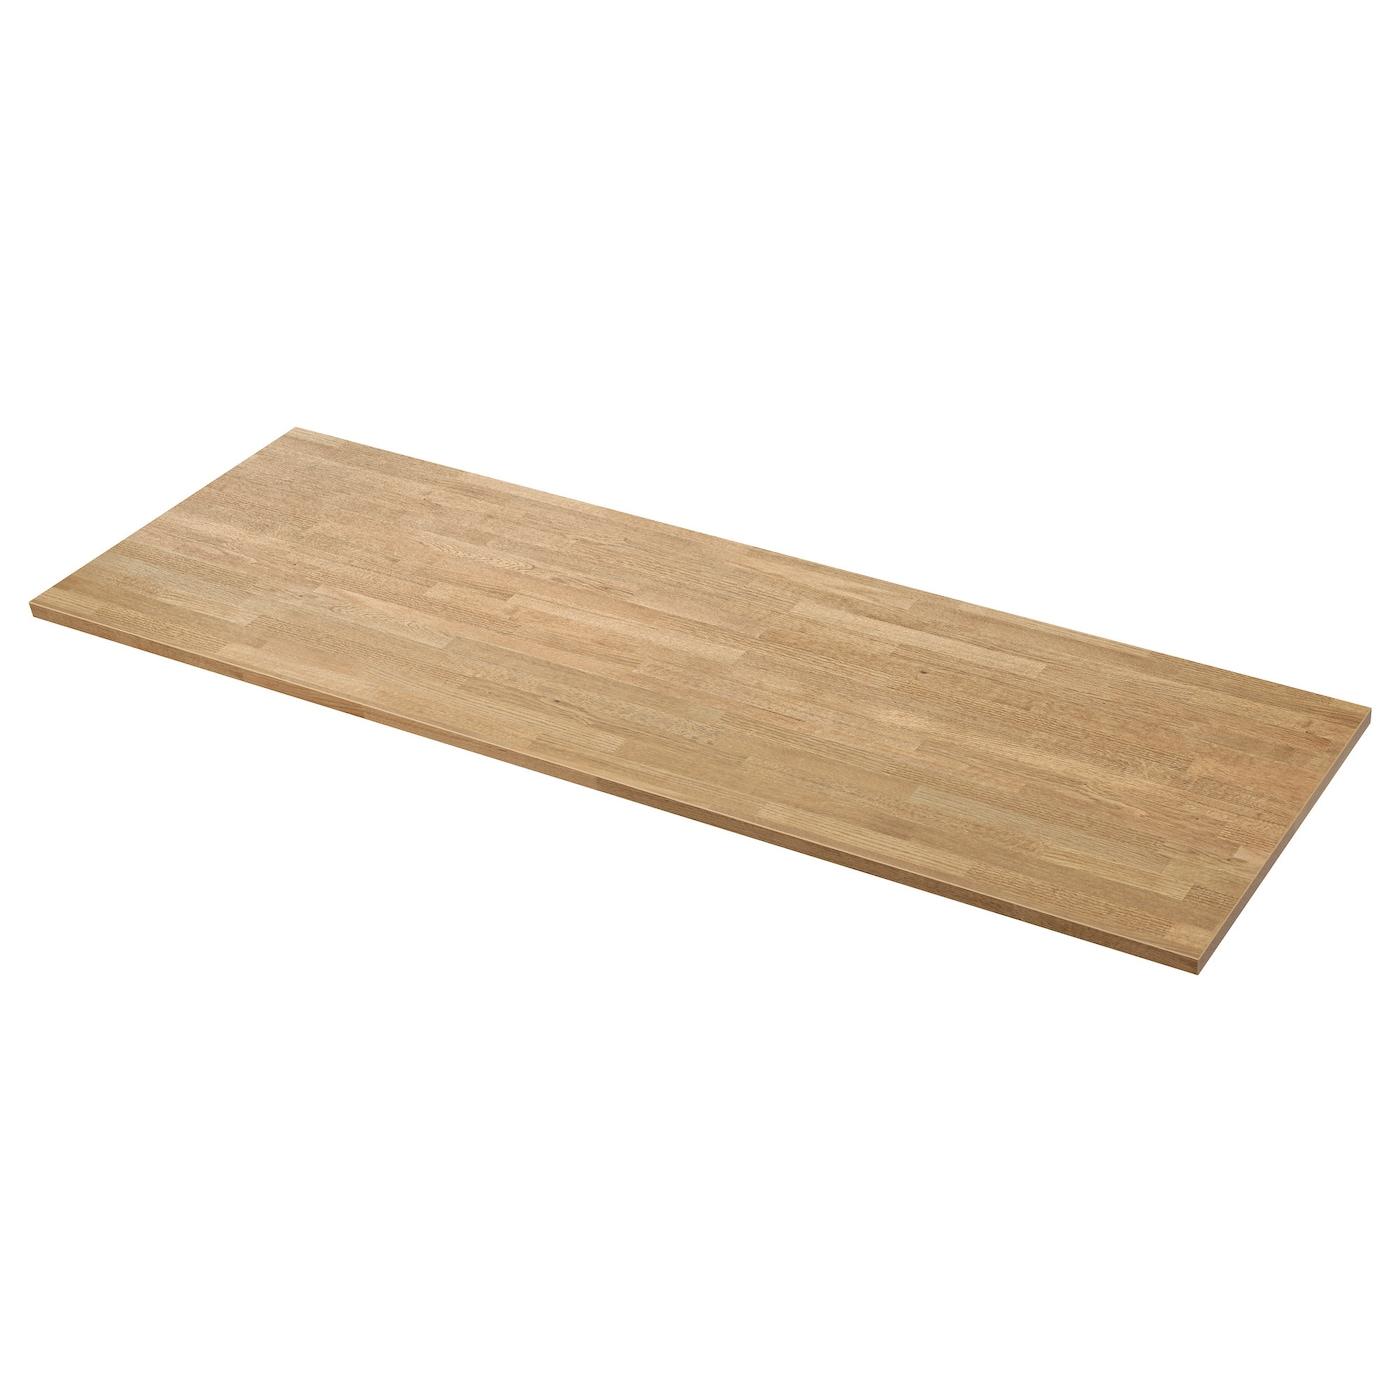 s ljan custom made worktop oak effect laminate 10 45x3 8 cm ikea. Black Bedroom Furniture Sets. Home Design Ideas